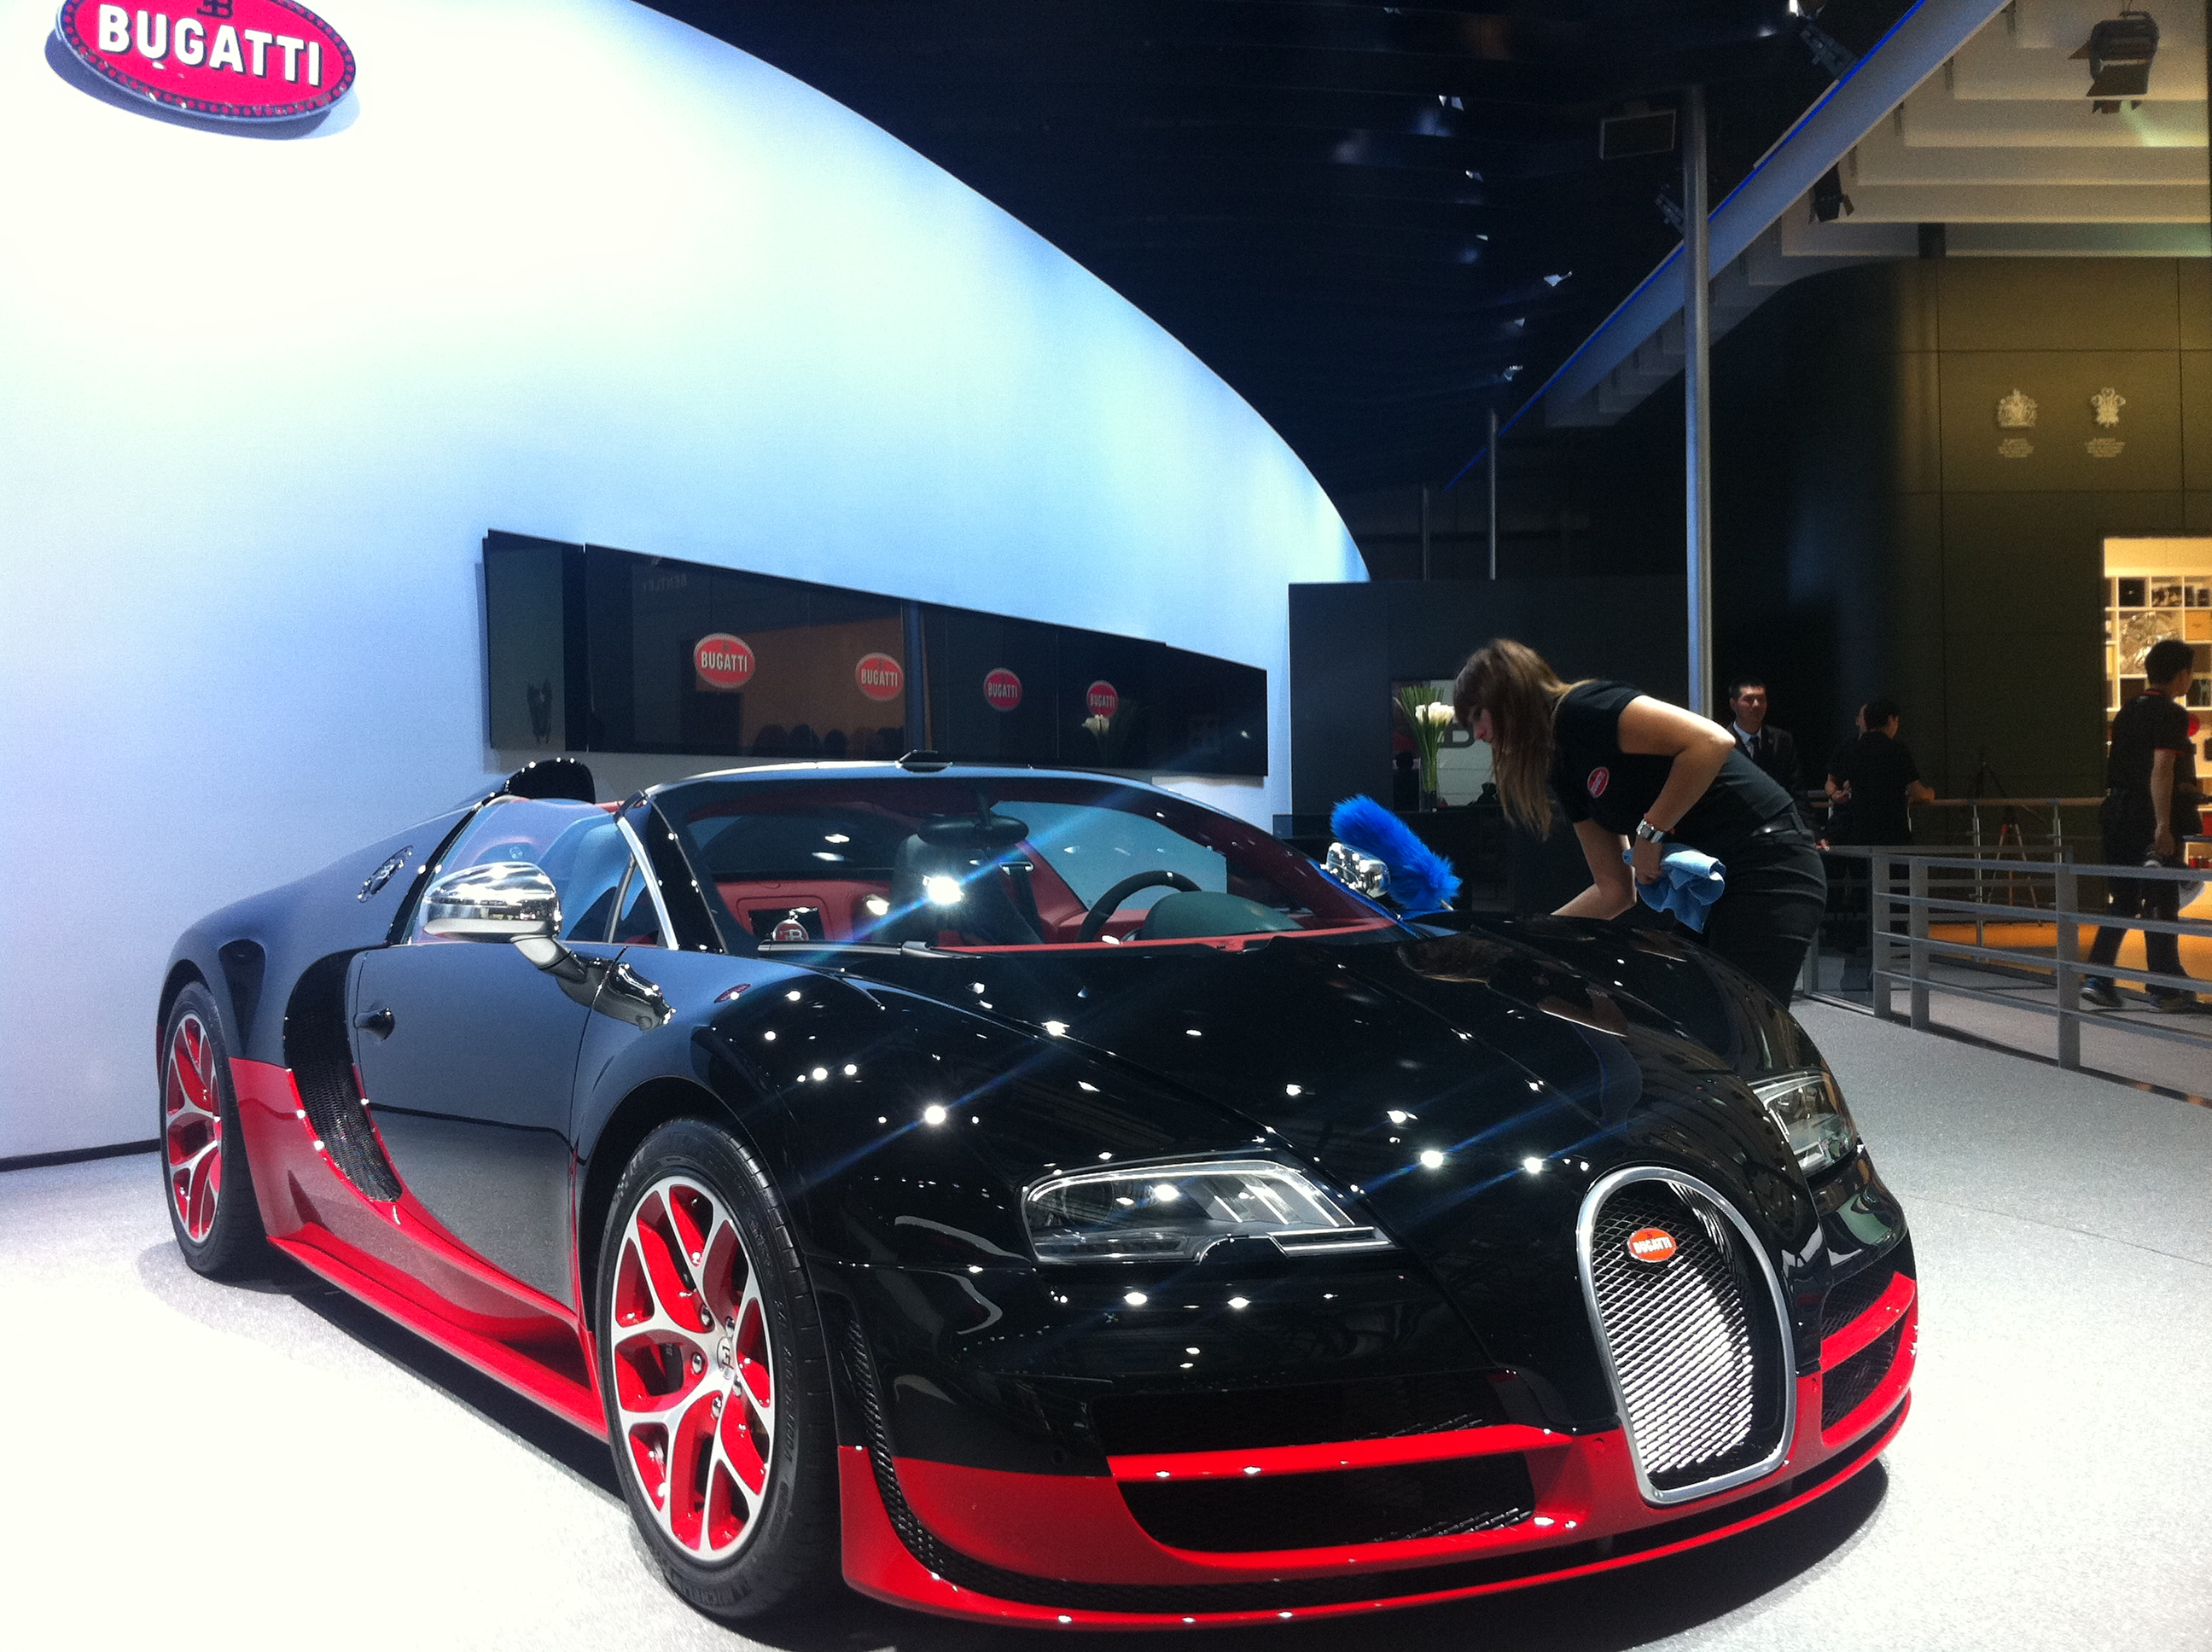 2012-auto-china-beijing-auto-show-2012-bugatti-veyron-grand-sport-vitesse-black-red-img_3546 Astounding Xe Bugatti Veyron Grand Sport Vitesse Cars Trend